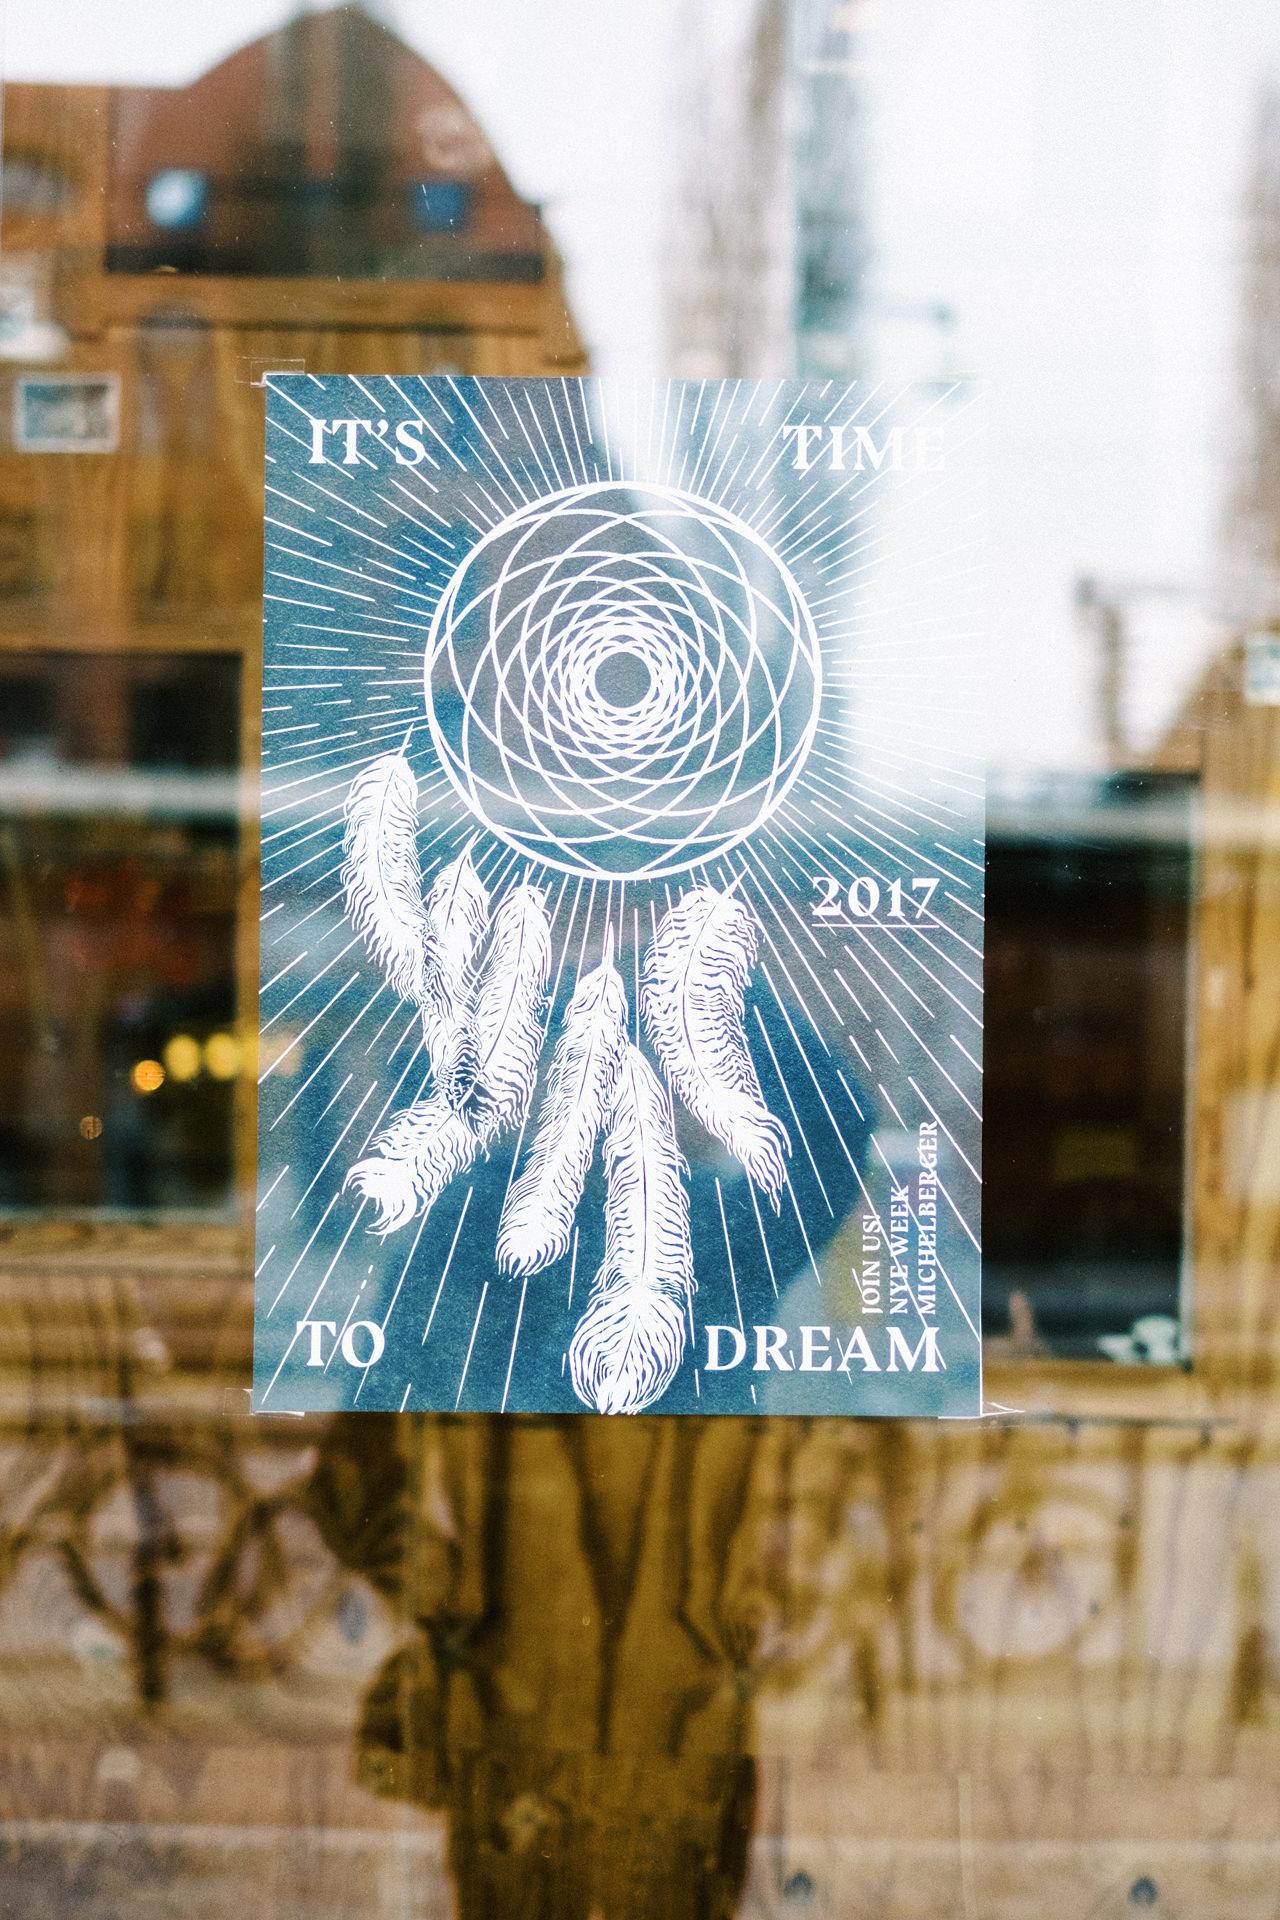 Europe 2016 - Berlin 81